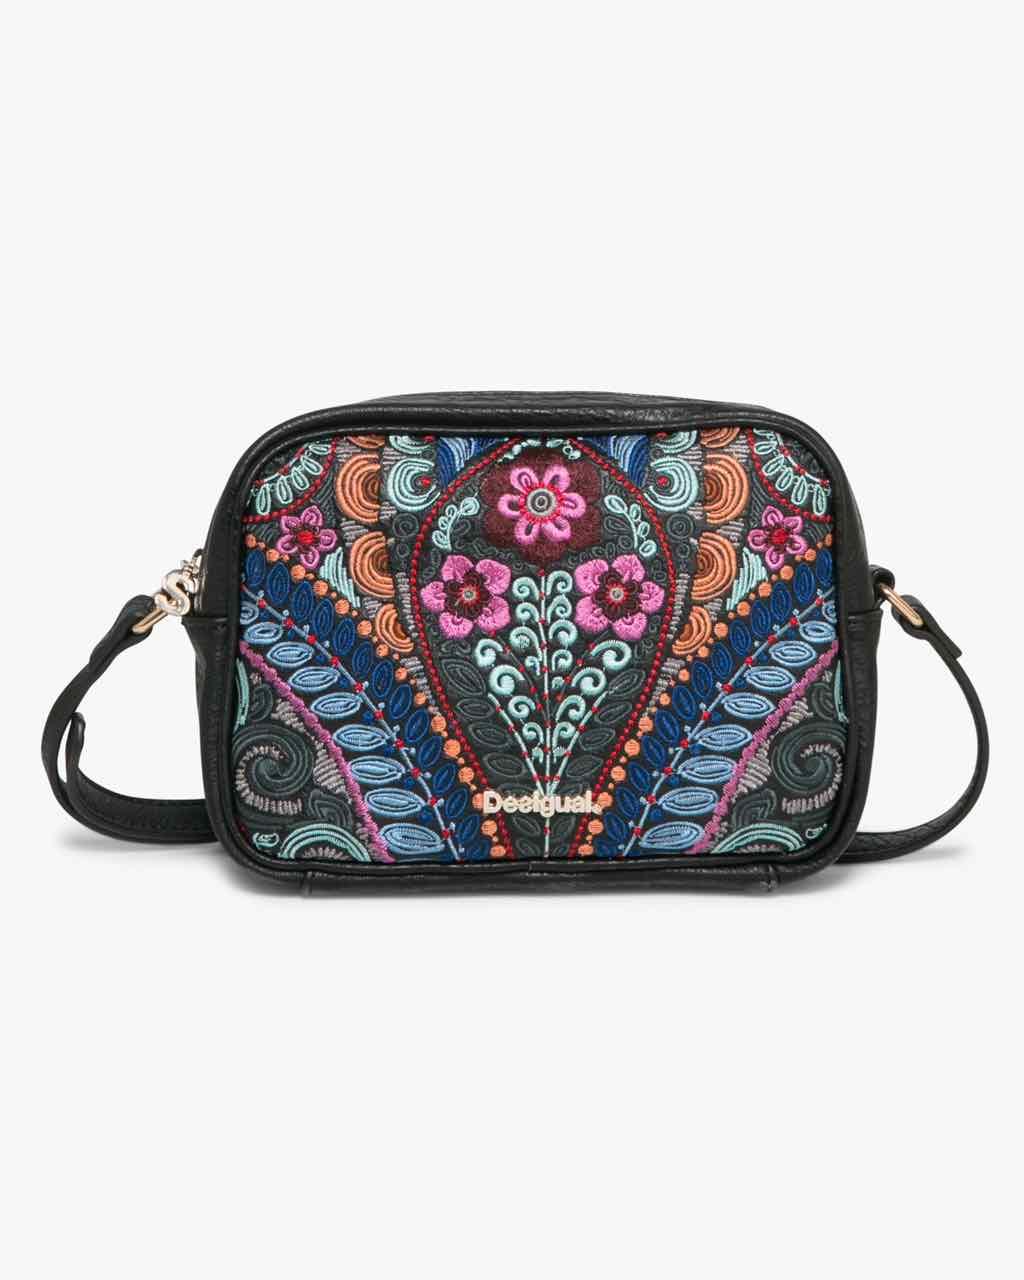 17WAXPQG_2000 Desigual Bag Charlotte Pika Buy Online